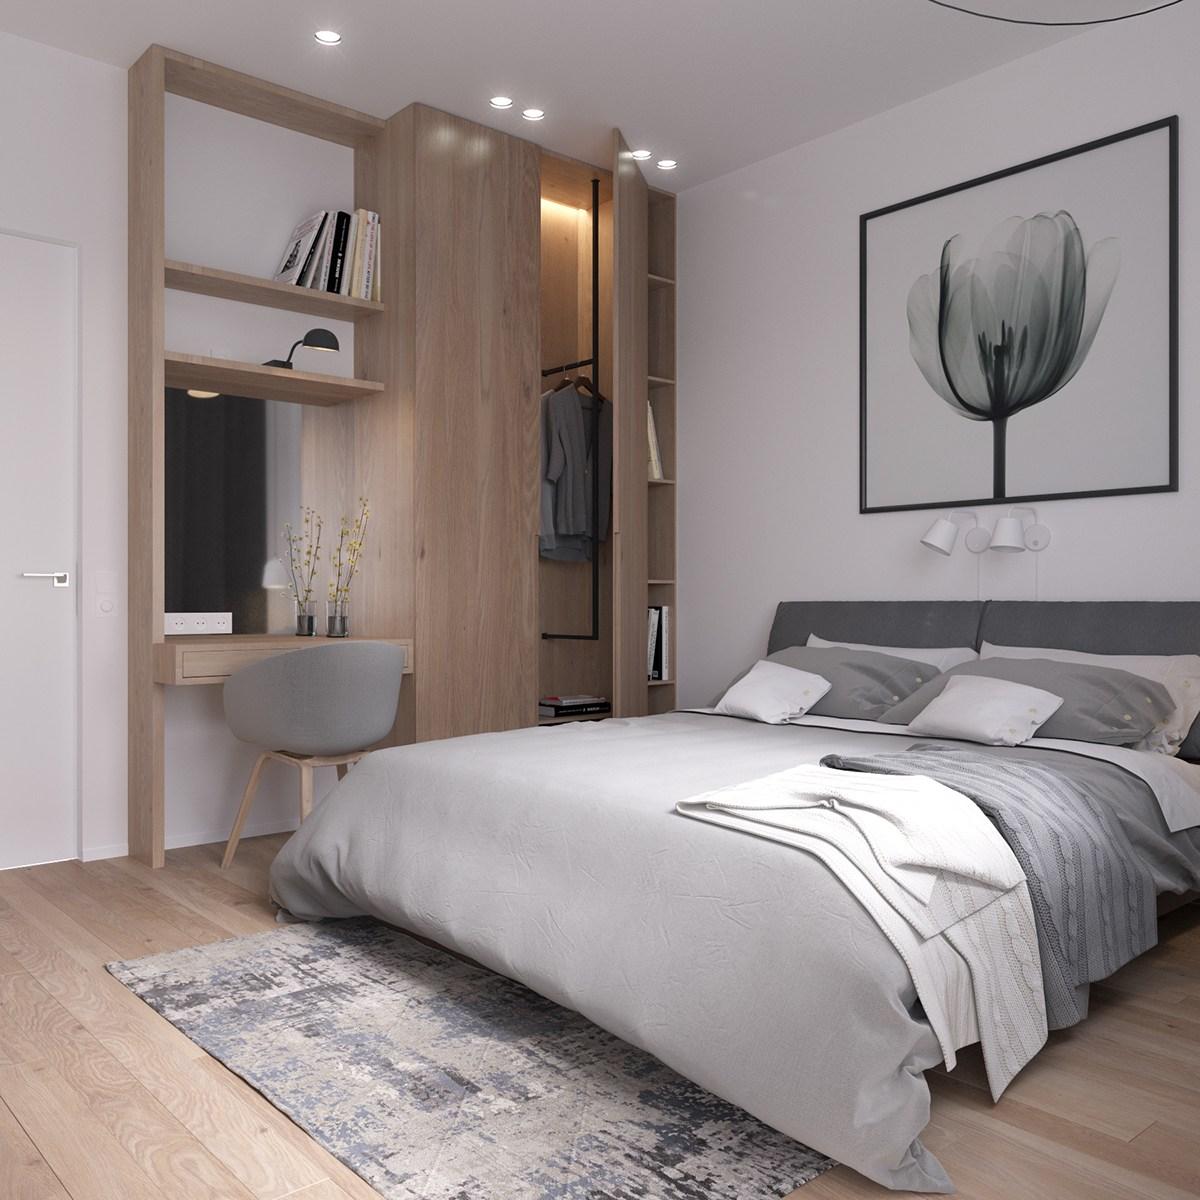 http://www.slaapkamer-ideeen.nl/wp-content/uploads/moderne-slaapkamer-met-werkplek-kledingkast-combinatie-2.jpg